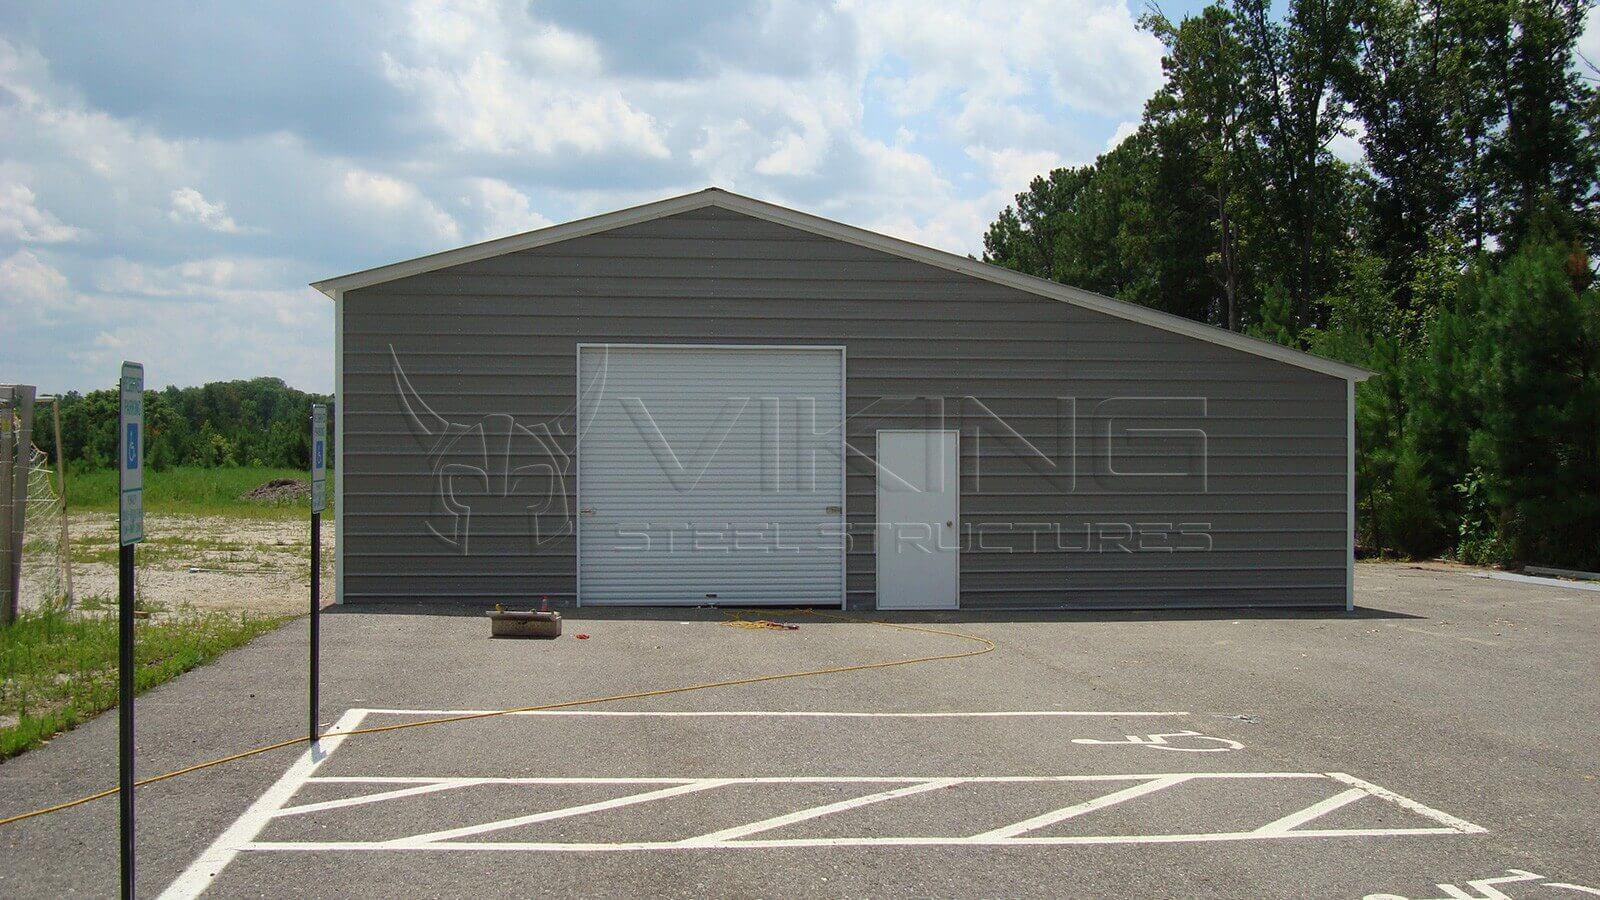 Enclosed Carport Metal Building : Viking steel structures metal carports barns garages